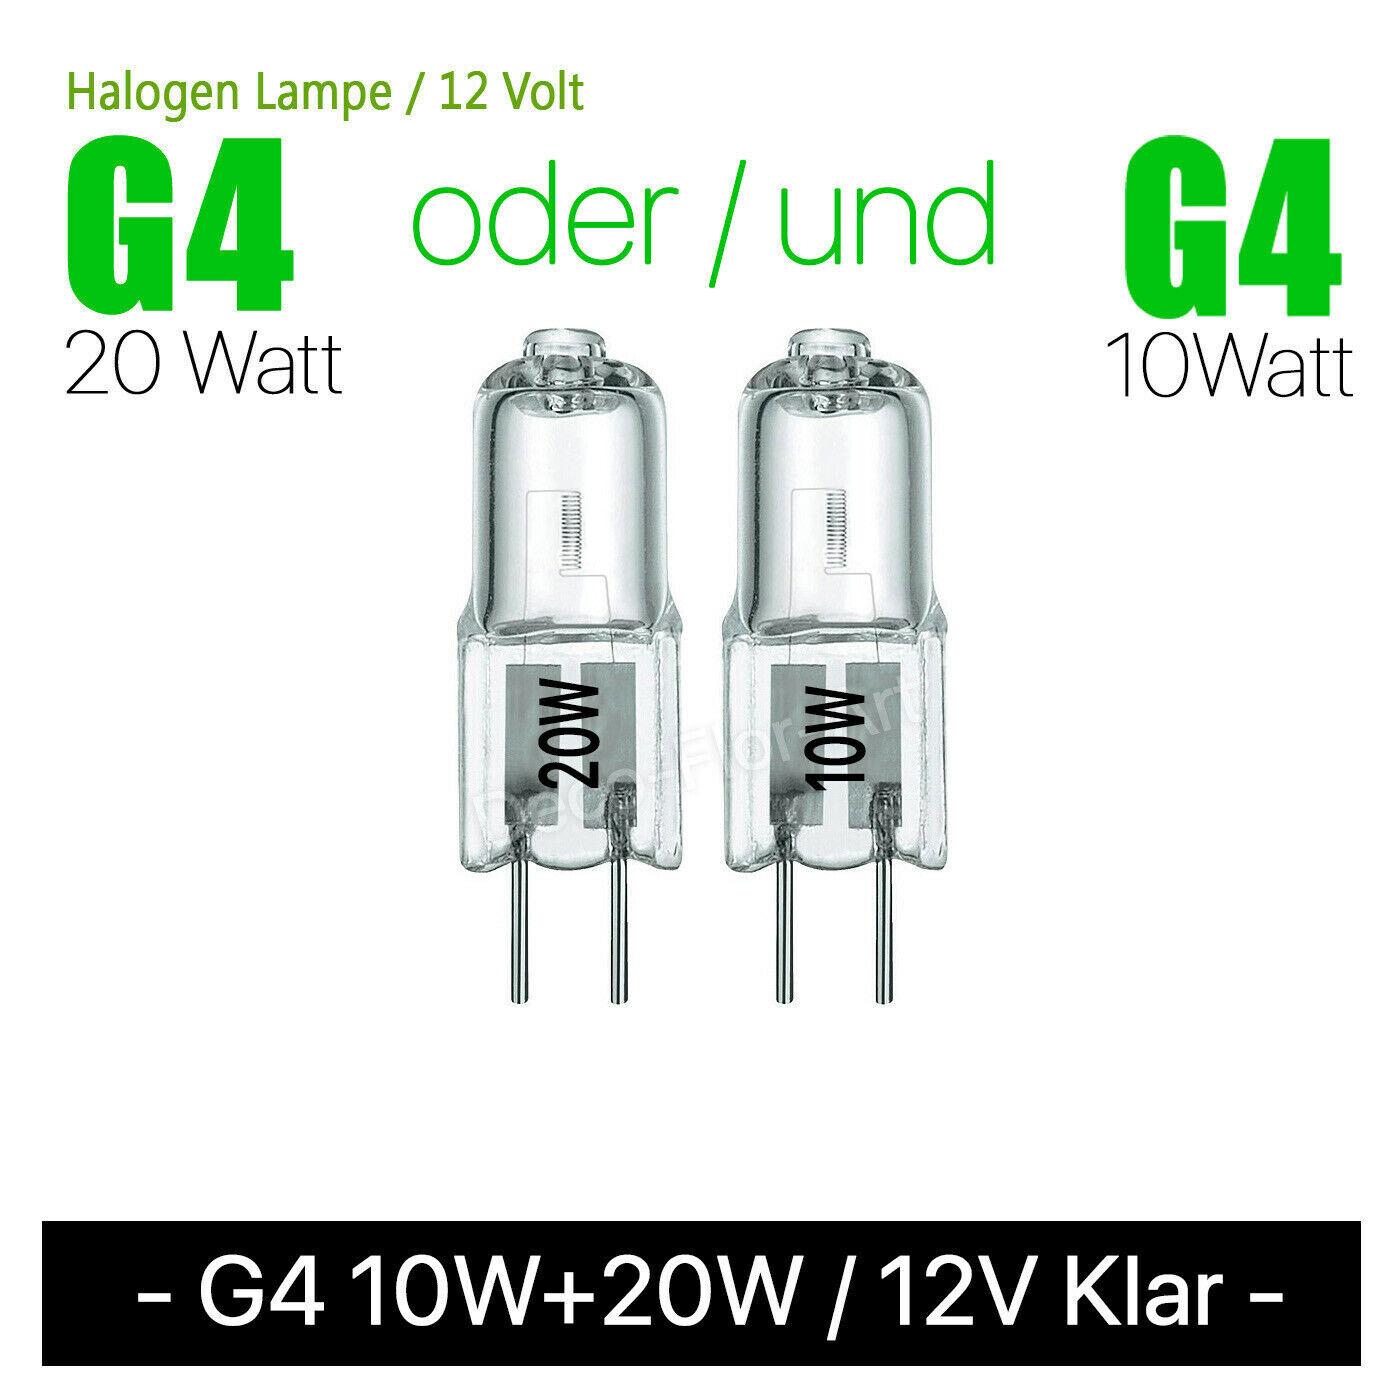 G4 10W oder 20W 12V - klar - Halogenlampe Halogen Lampe Stiftsockel Lampensockel